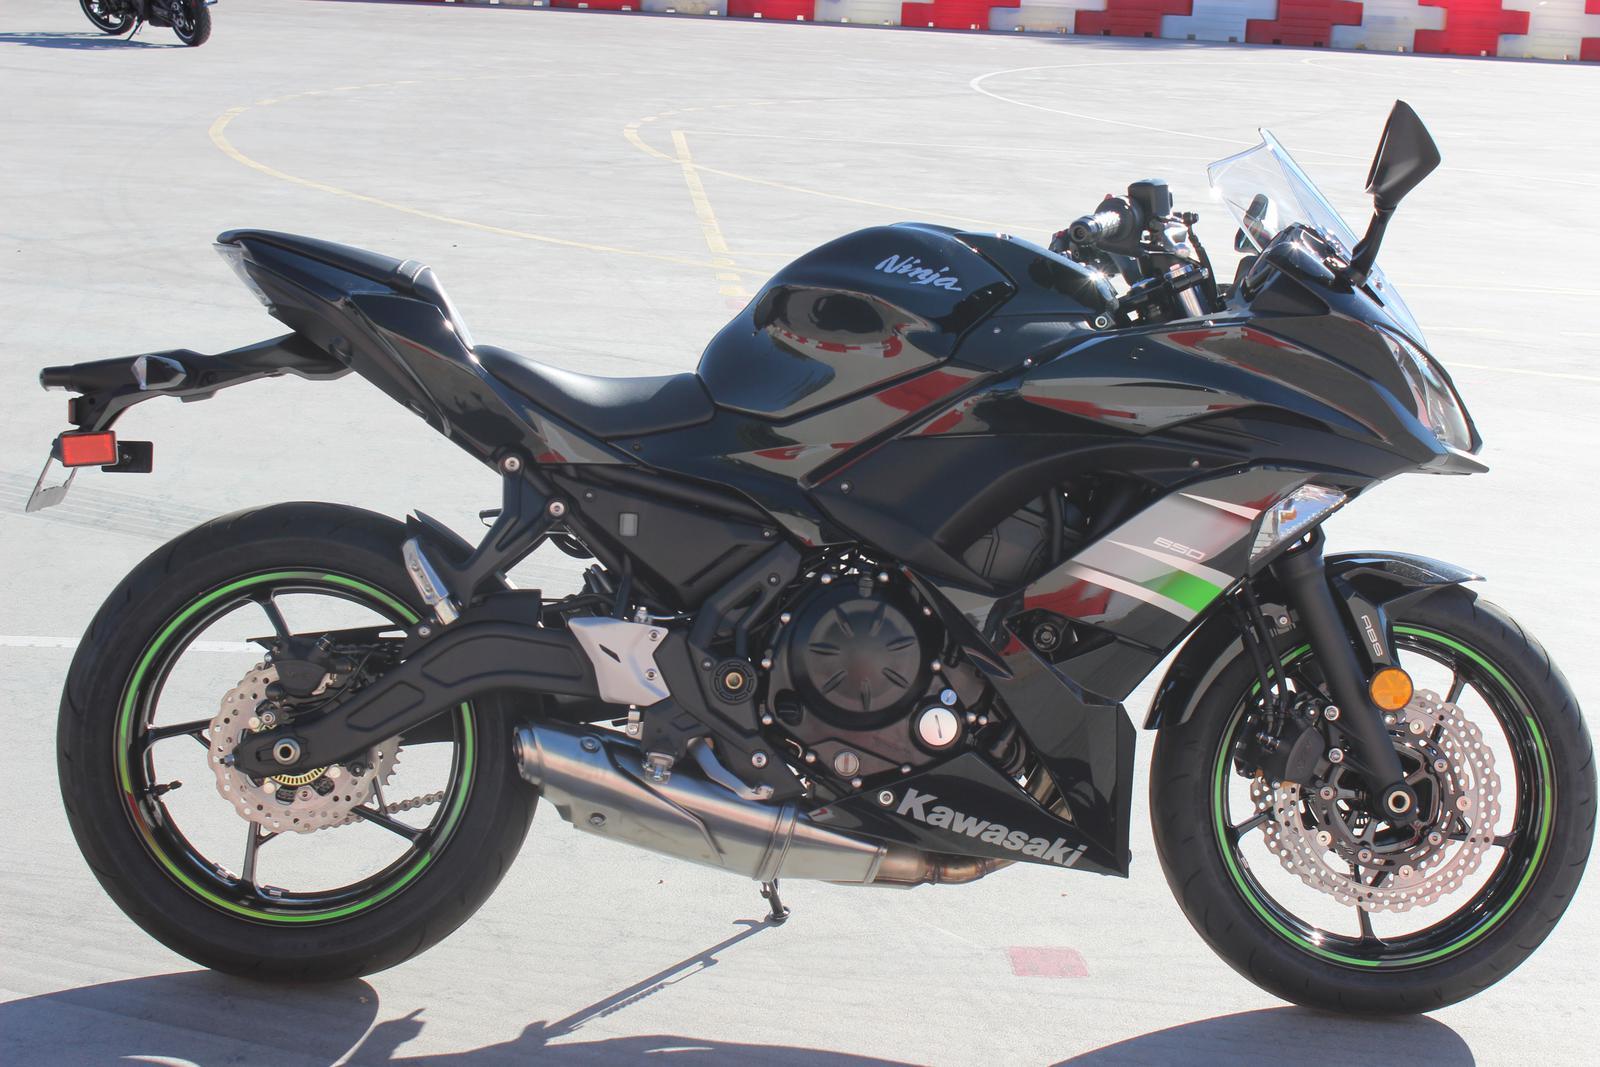 2019 Kawasaki Ninja 650 Abs For Sale In Scottsdale Az Go Az